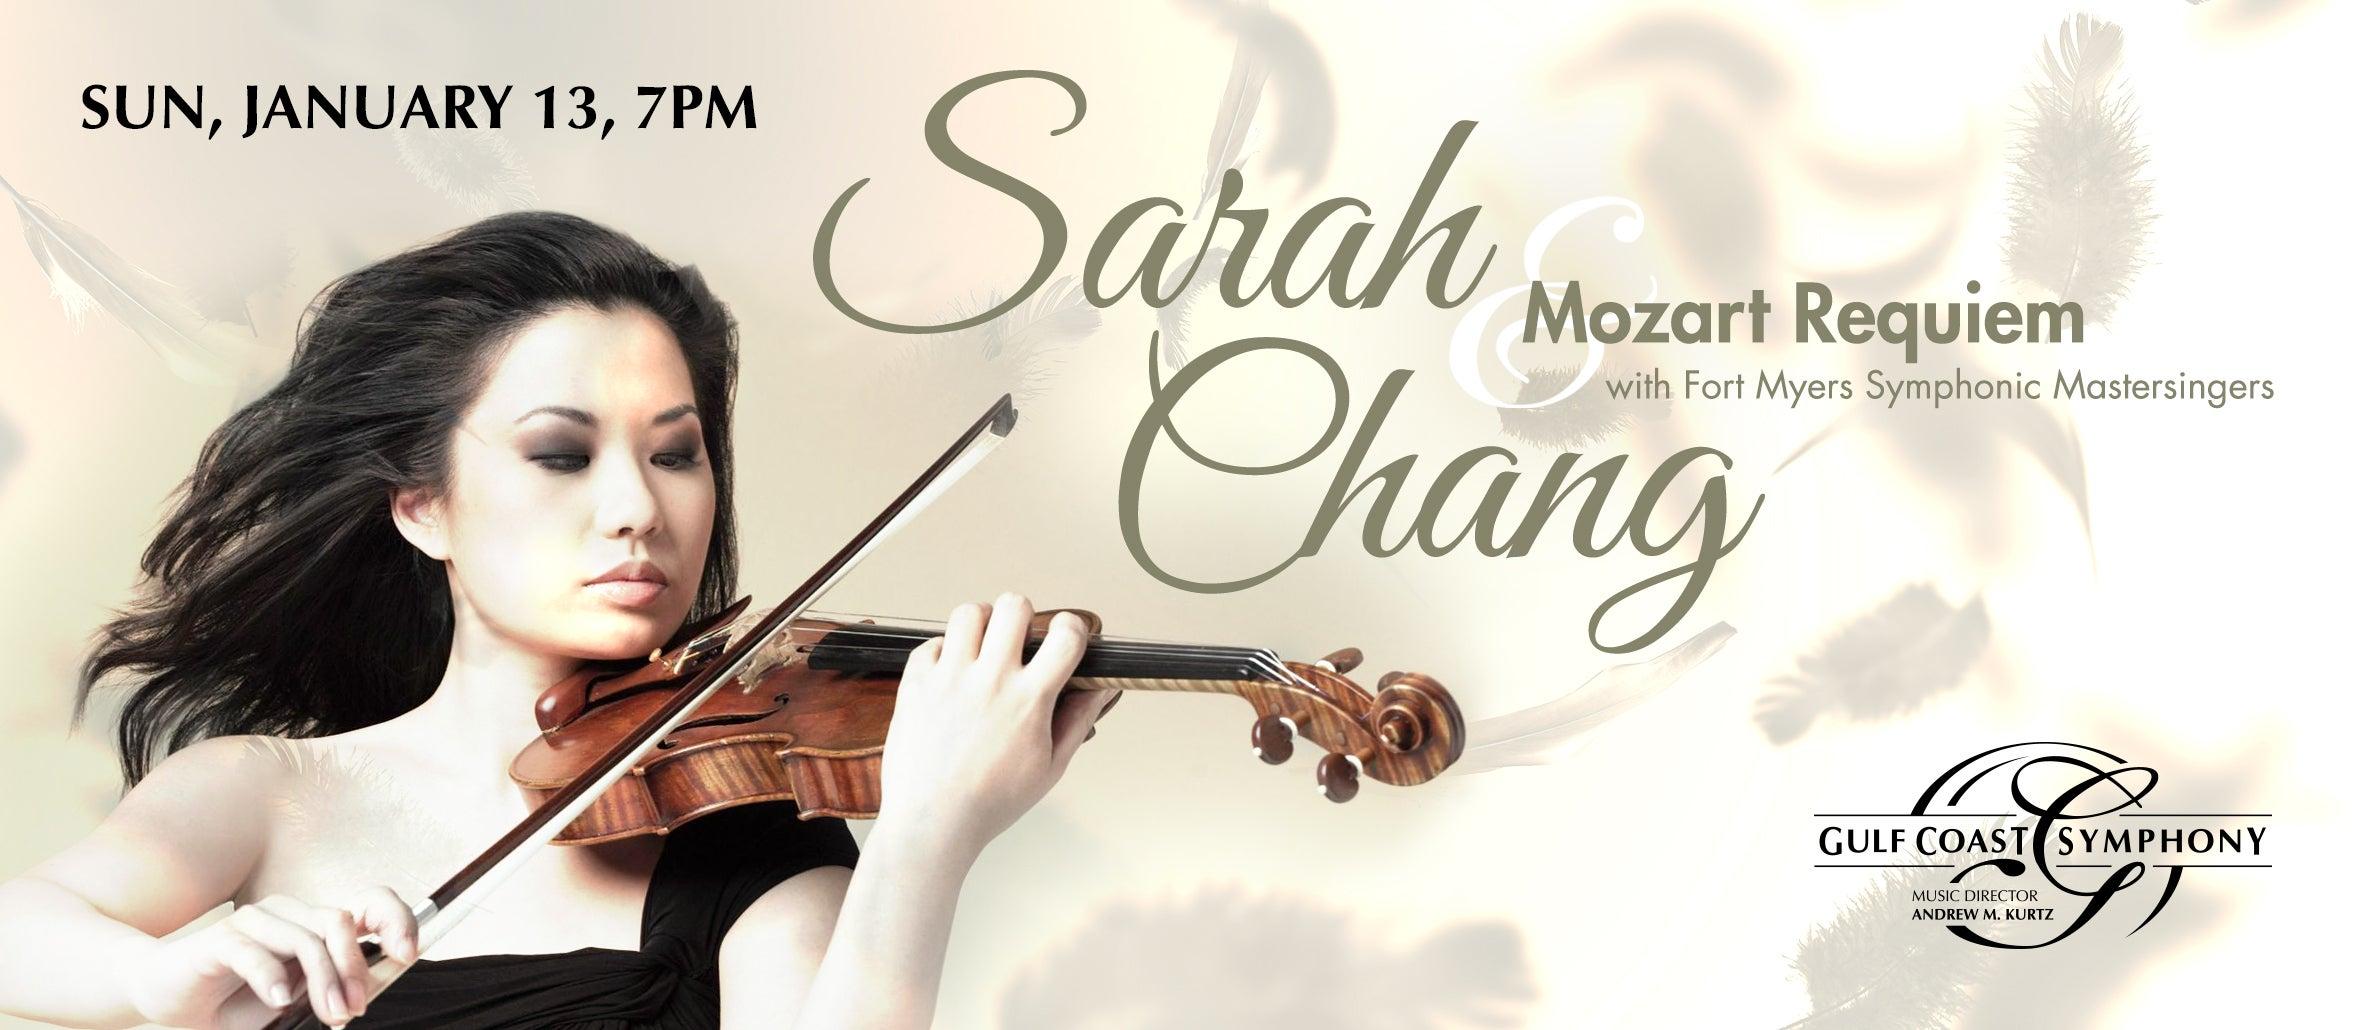 Gulf Coast Symphony: Sarah Chang Mozart Requiem